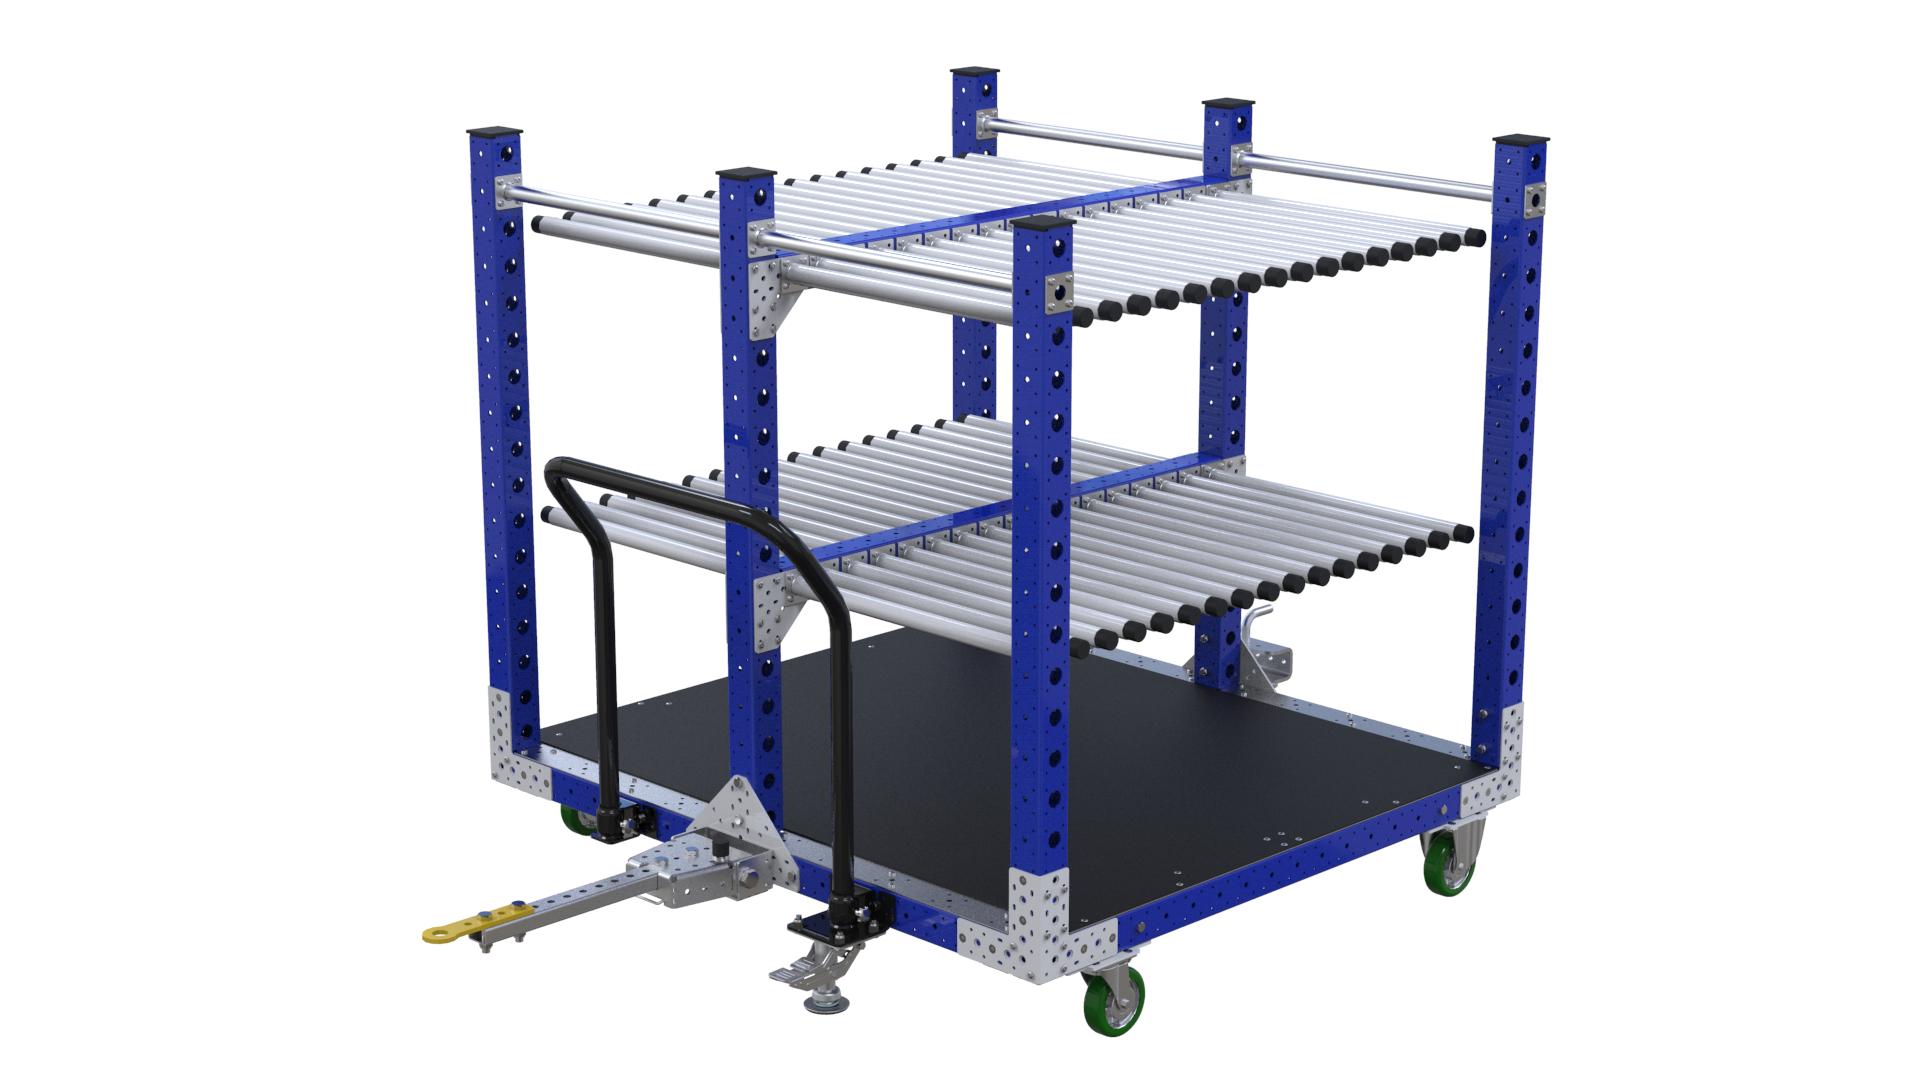 Kit cart designed to transport panels across a shop floor.